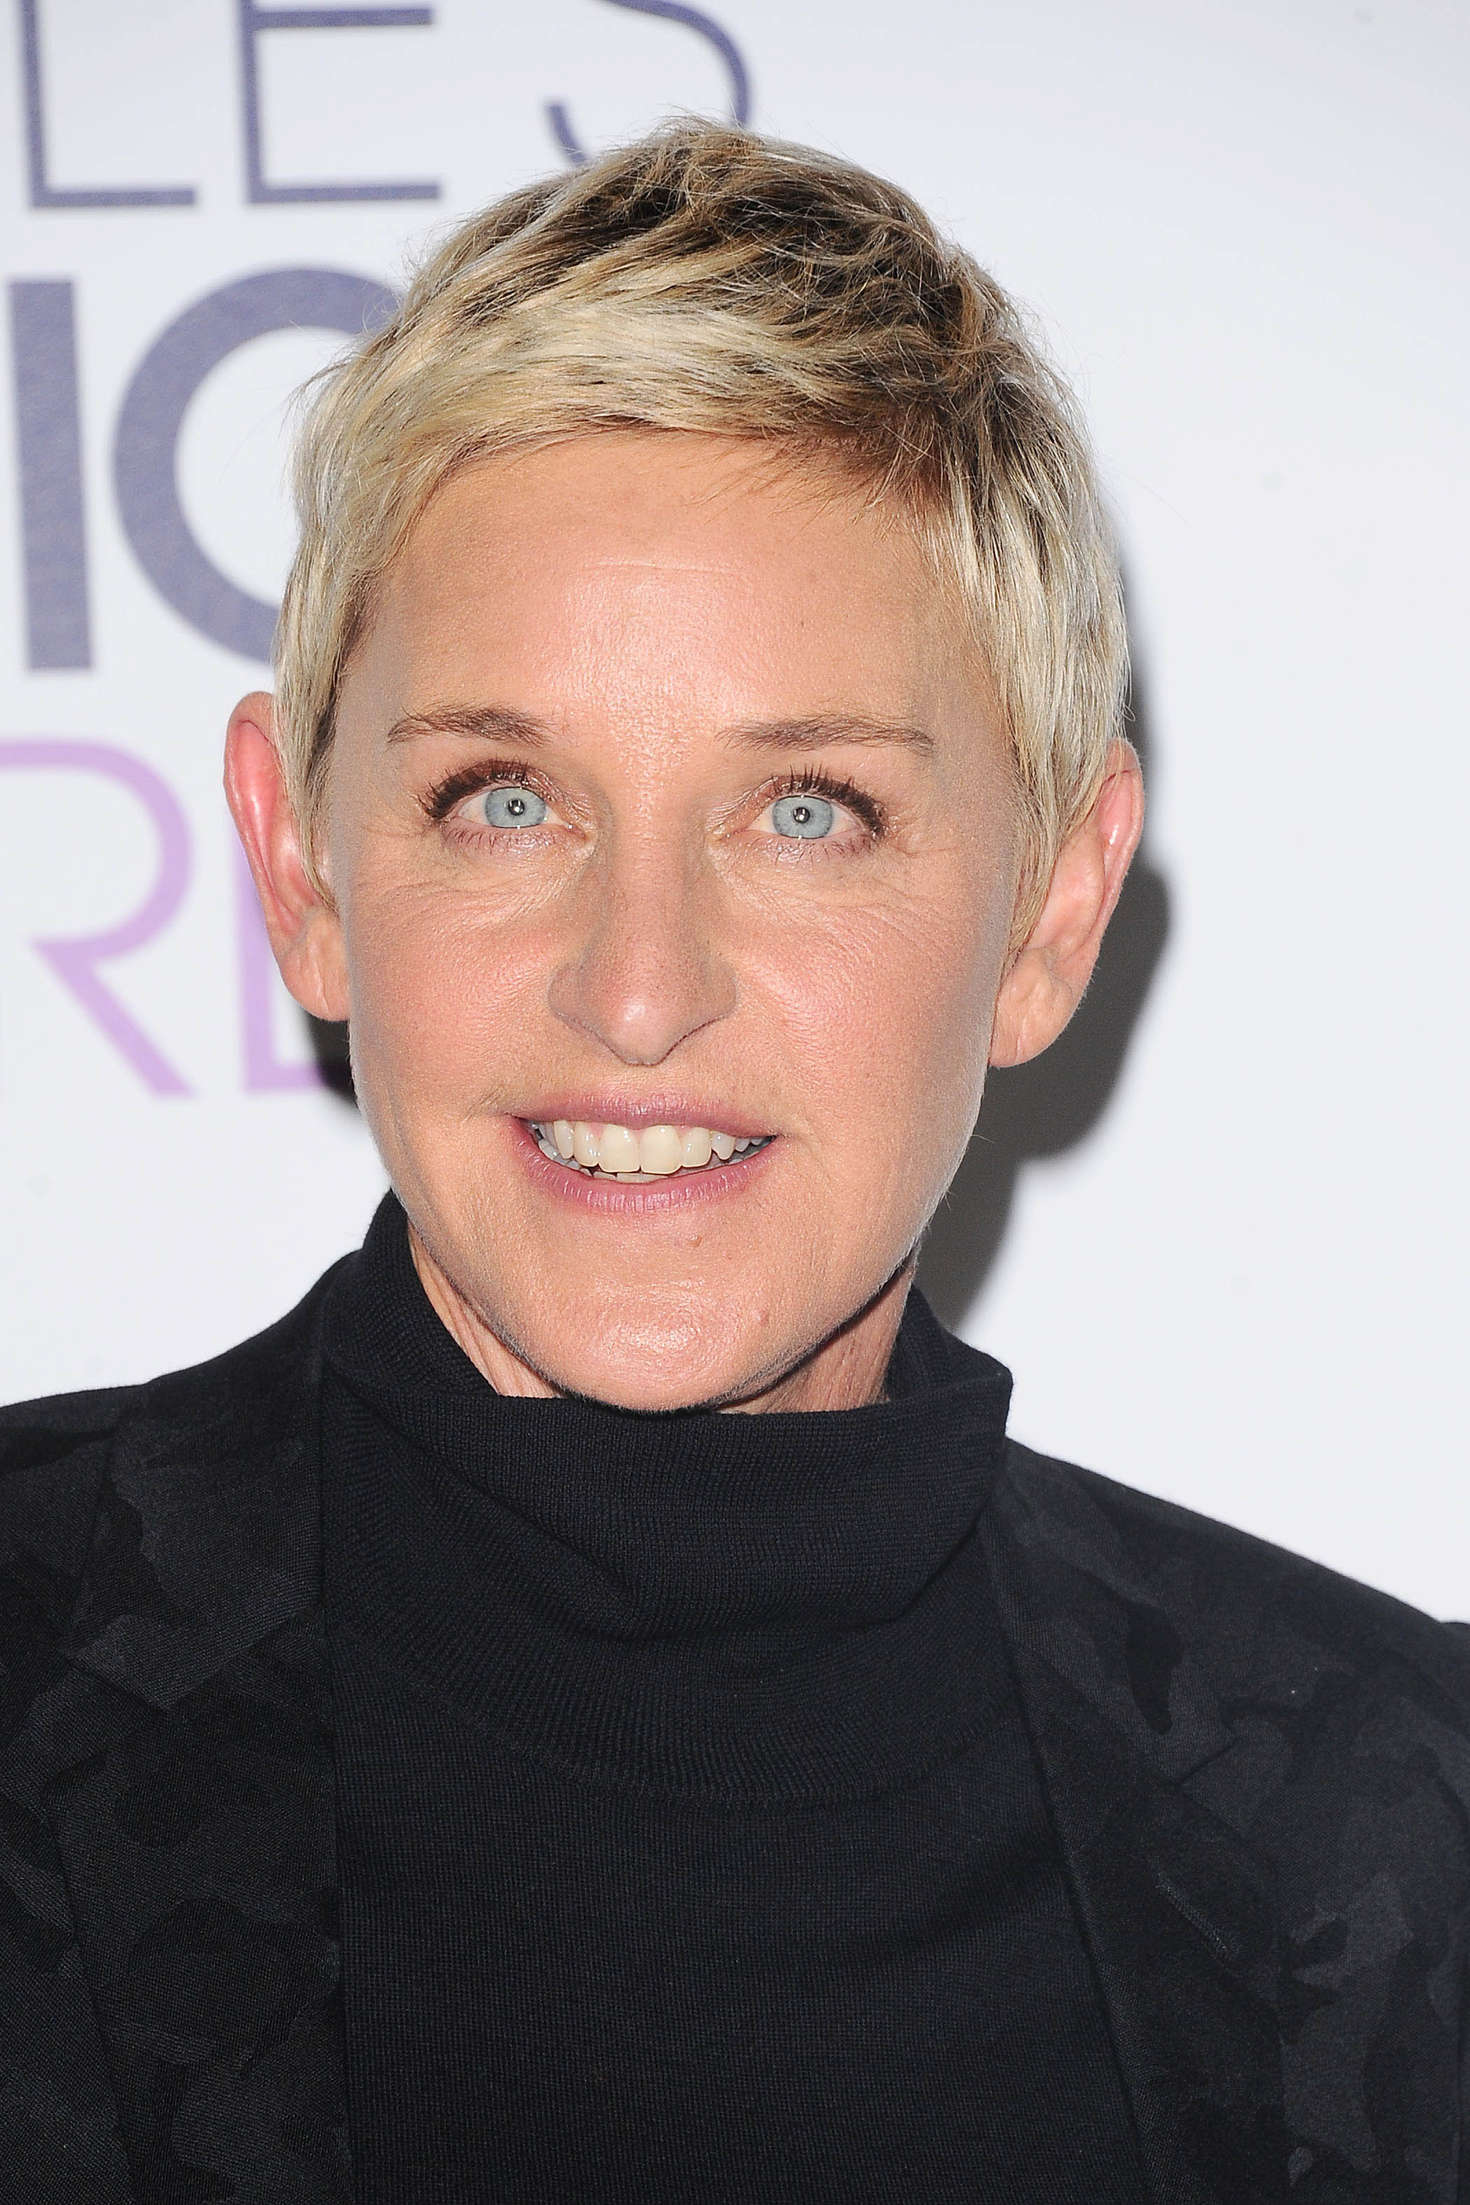 Ellen Degeneres Peoples Choice Awards in Los Angeles